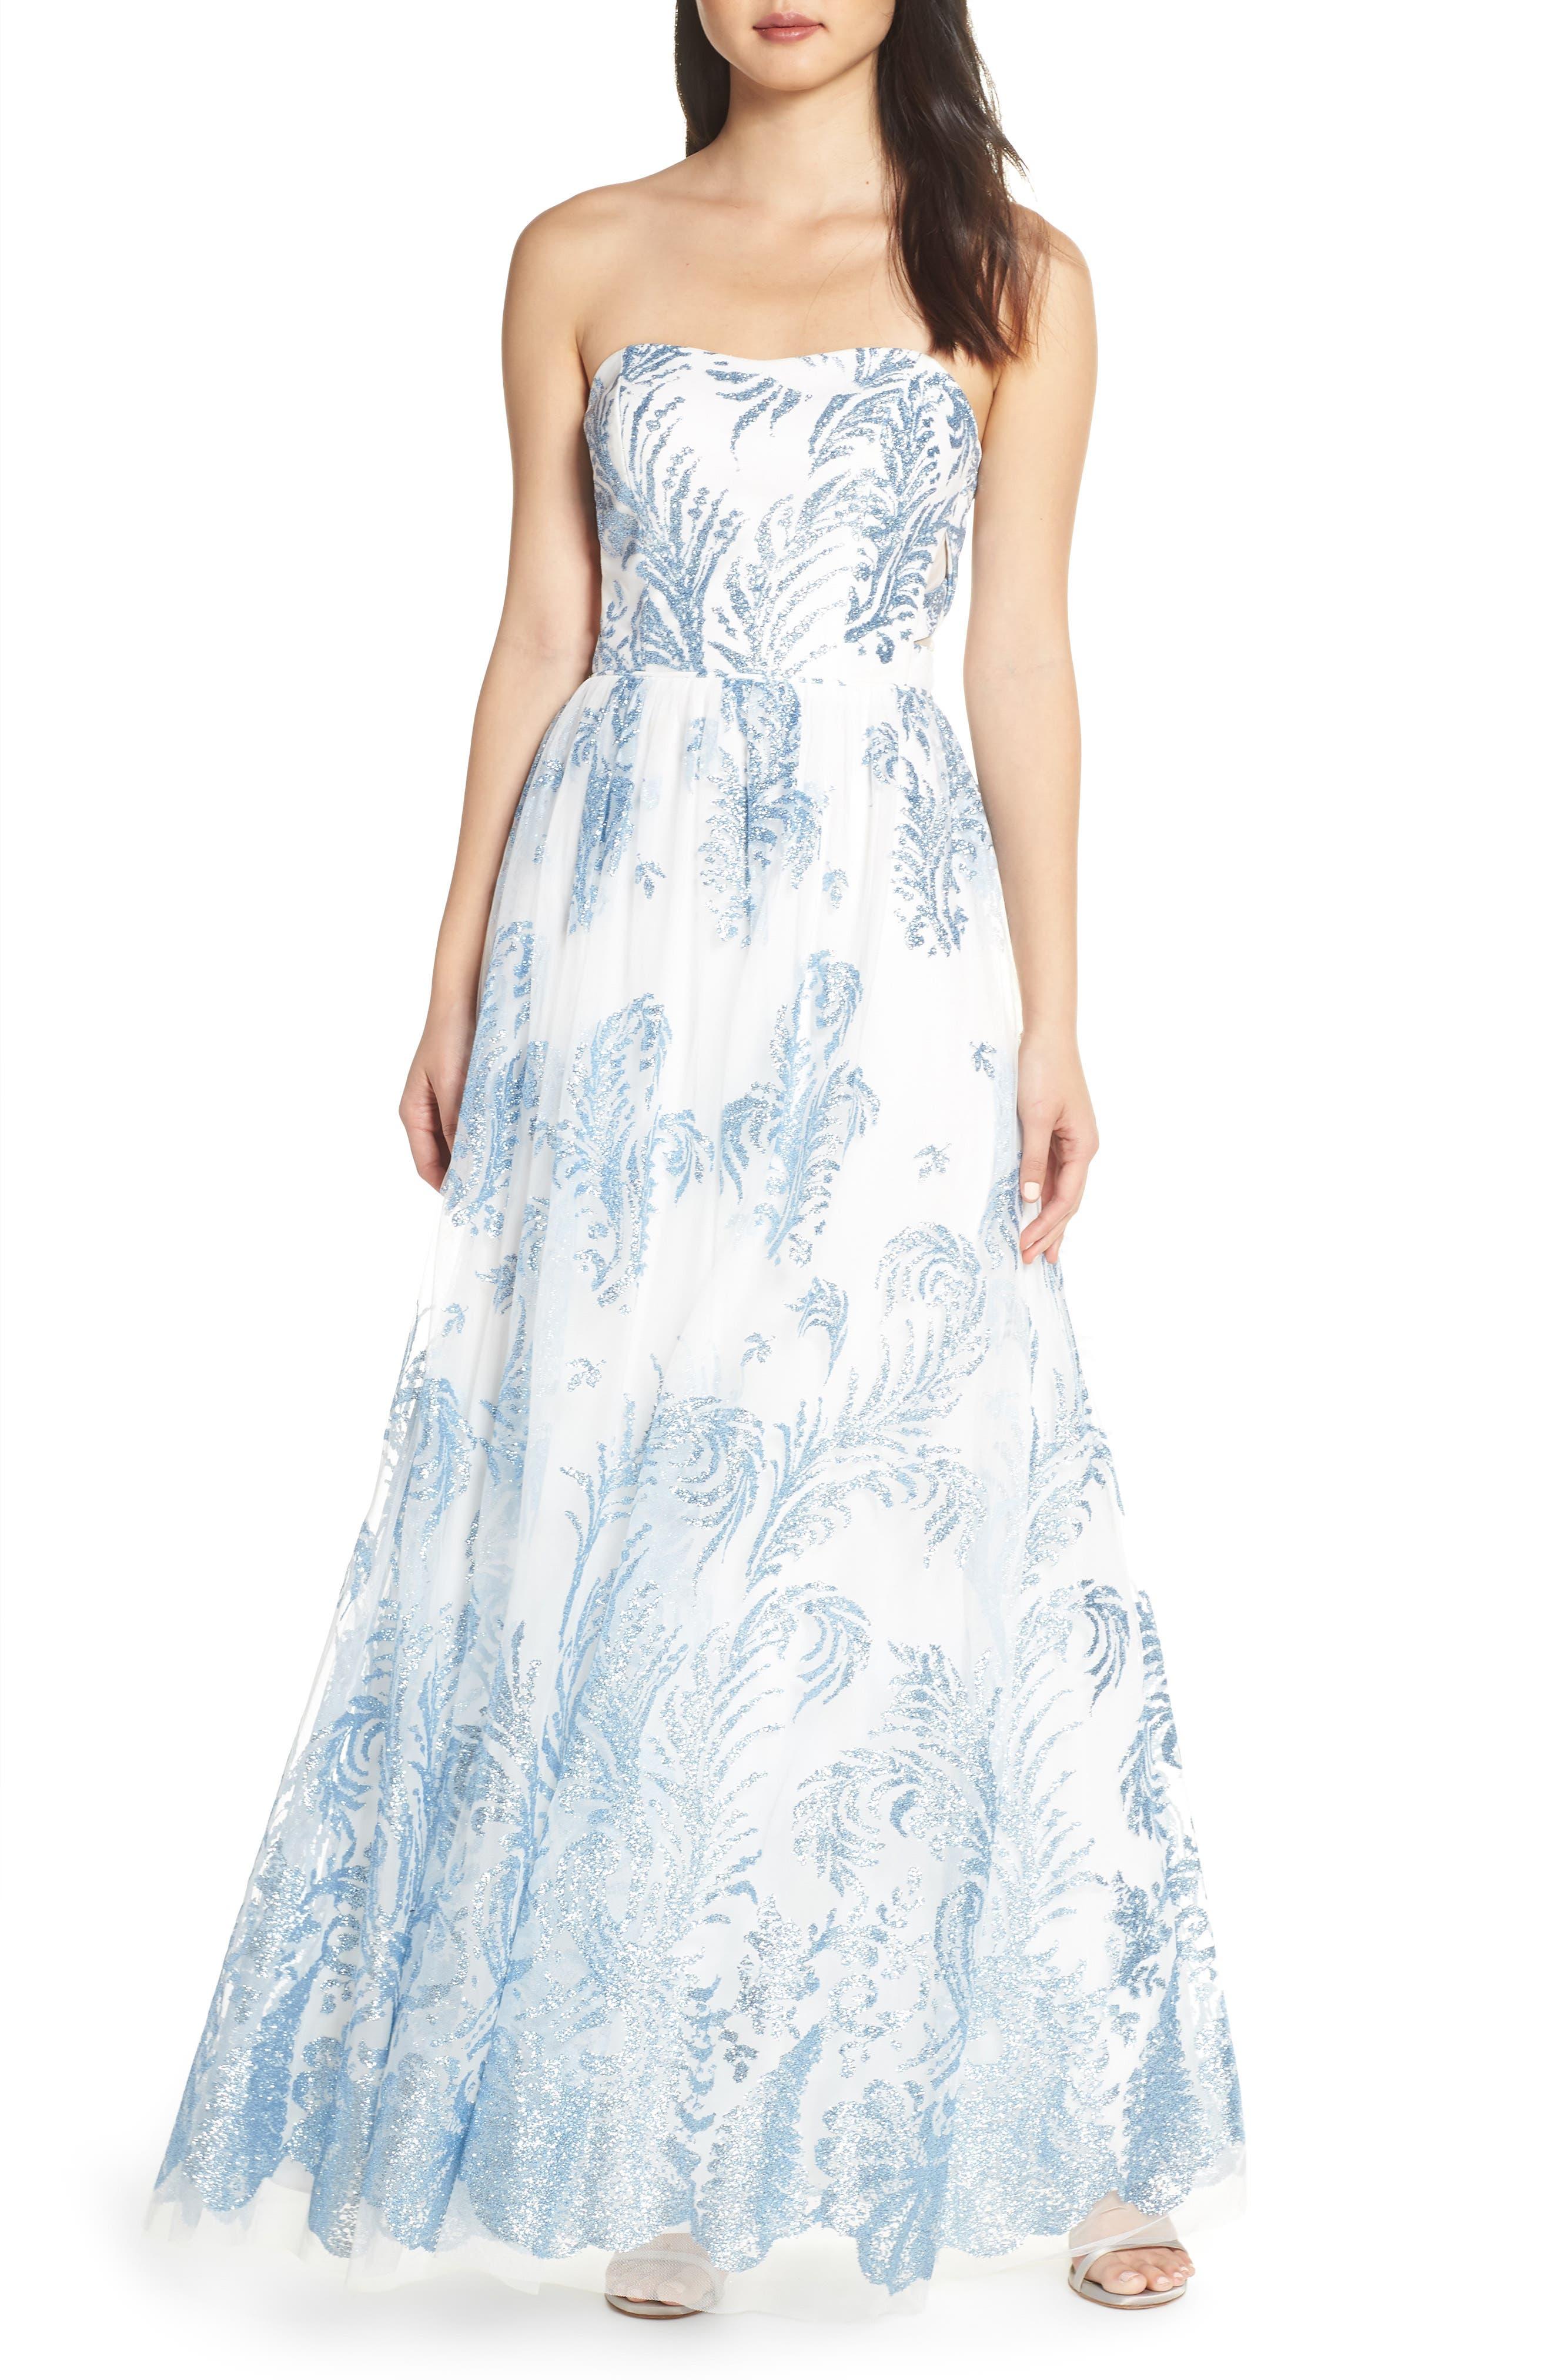 Strapless Glitter Mesh Evening Dress, Main, color, IVORY/ BLUE